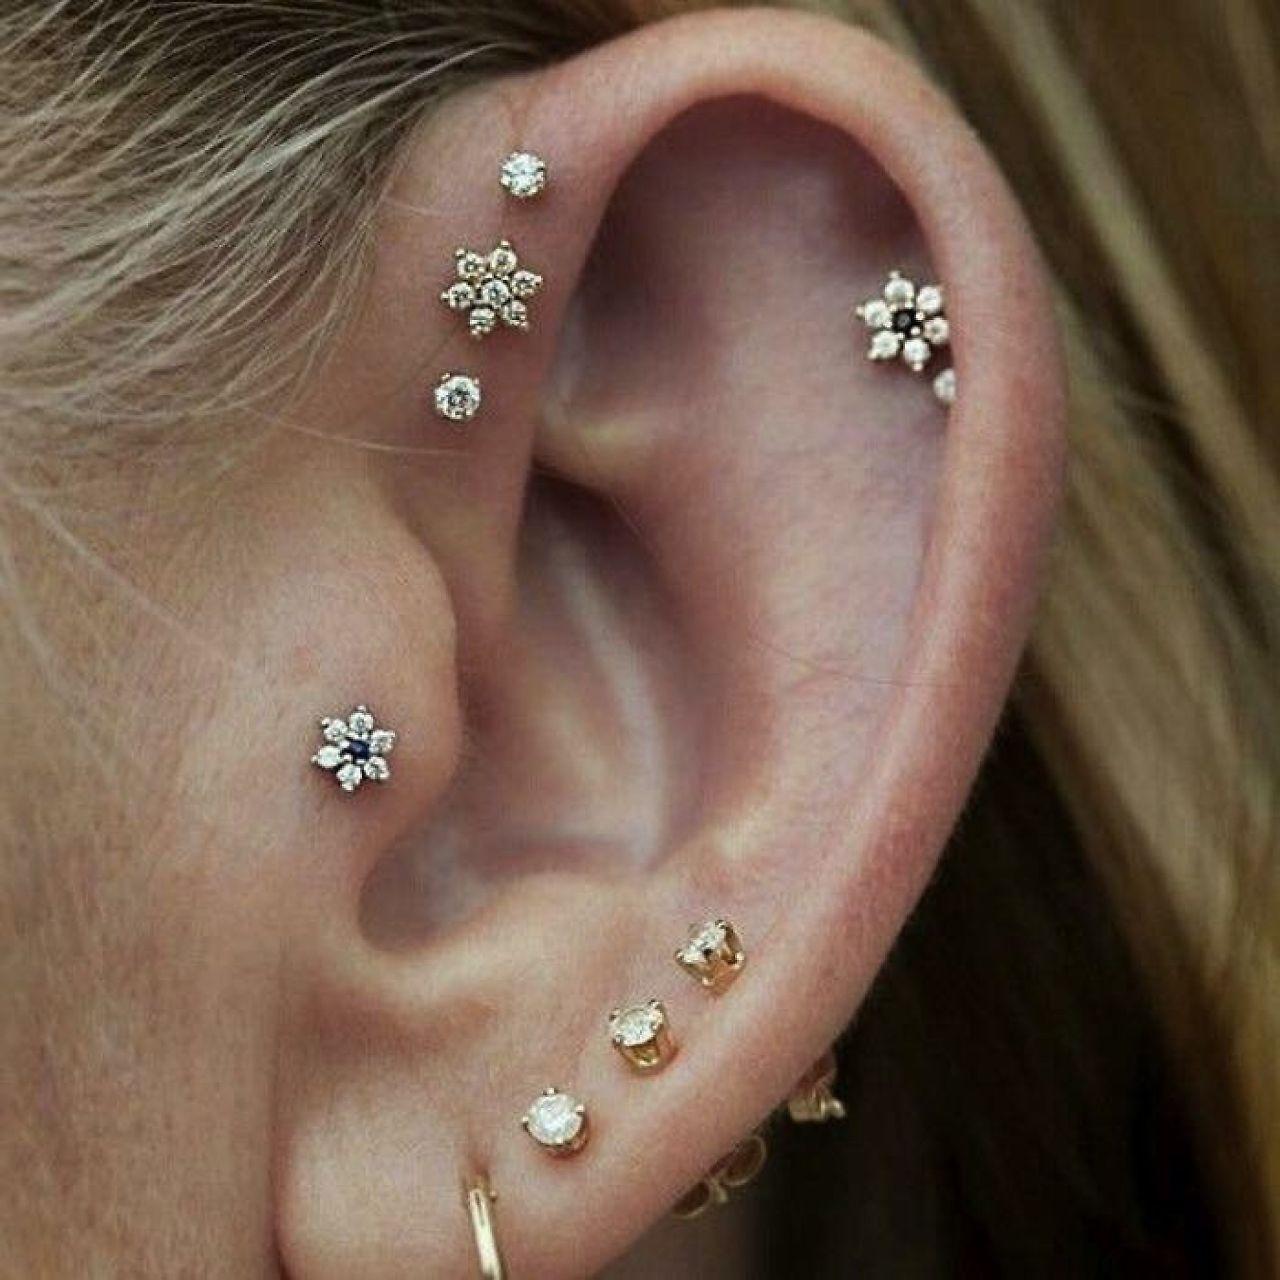 New piercing ideas  Pin by Angelique Gore on Earrings  Pinterest